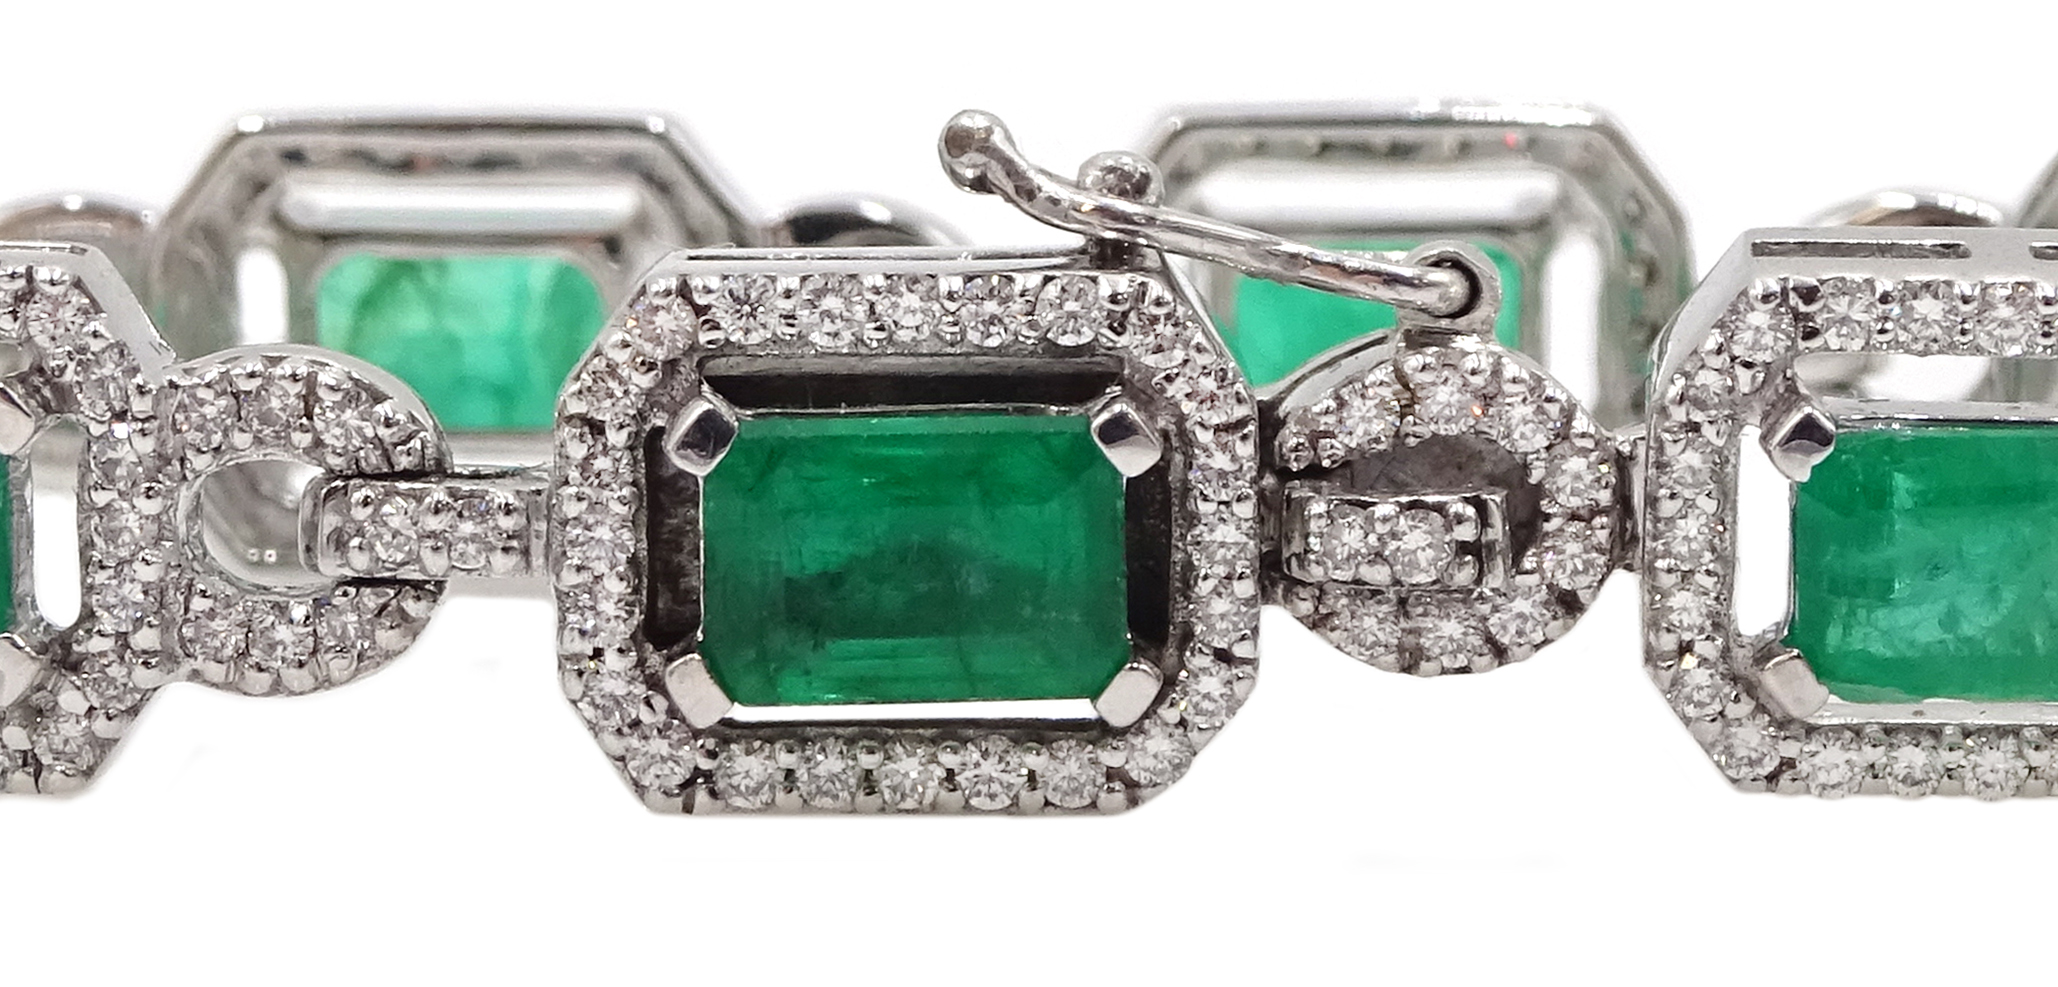 18ct white gold emerald cut emerald and round brilliant cut diamond bracelet, hallmarked, emerald - Image 4 of 4